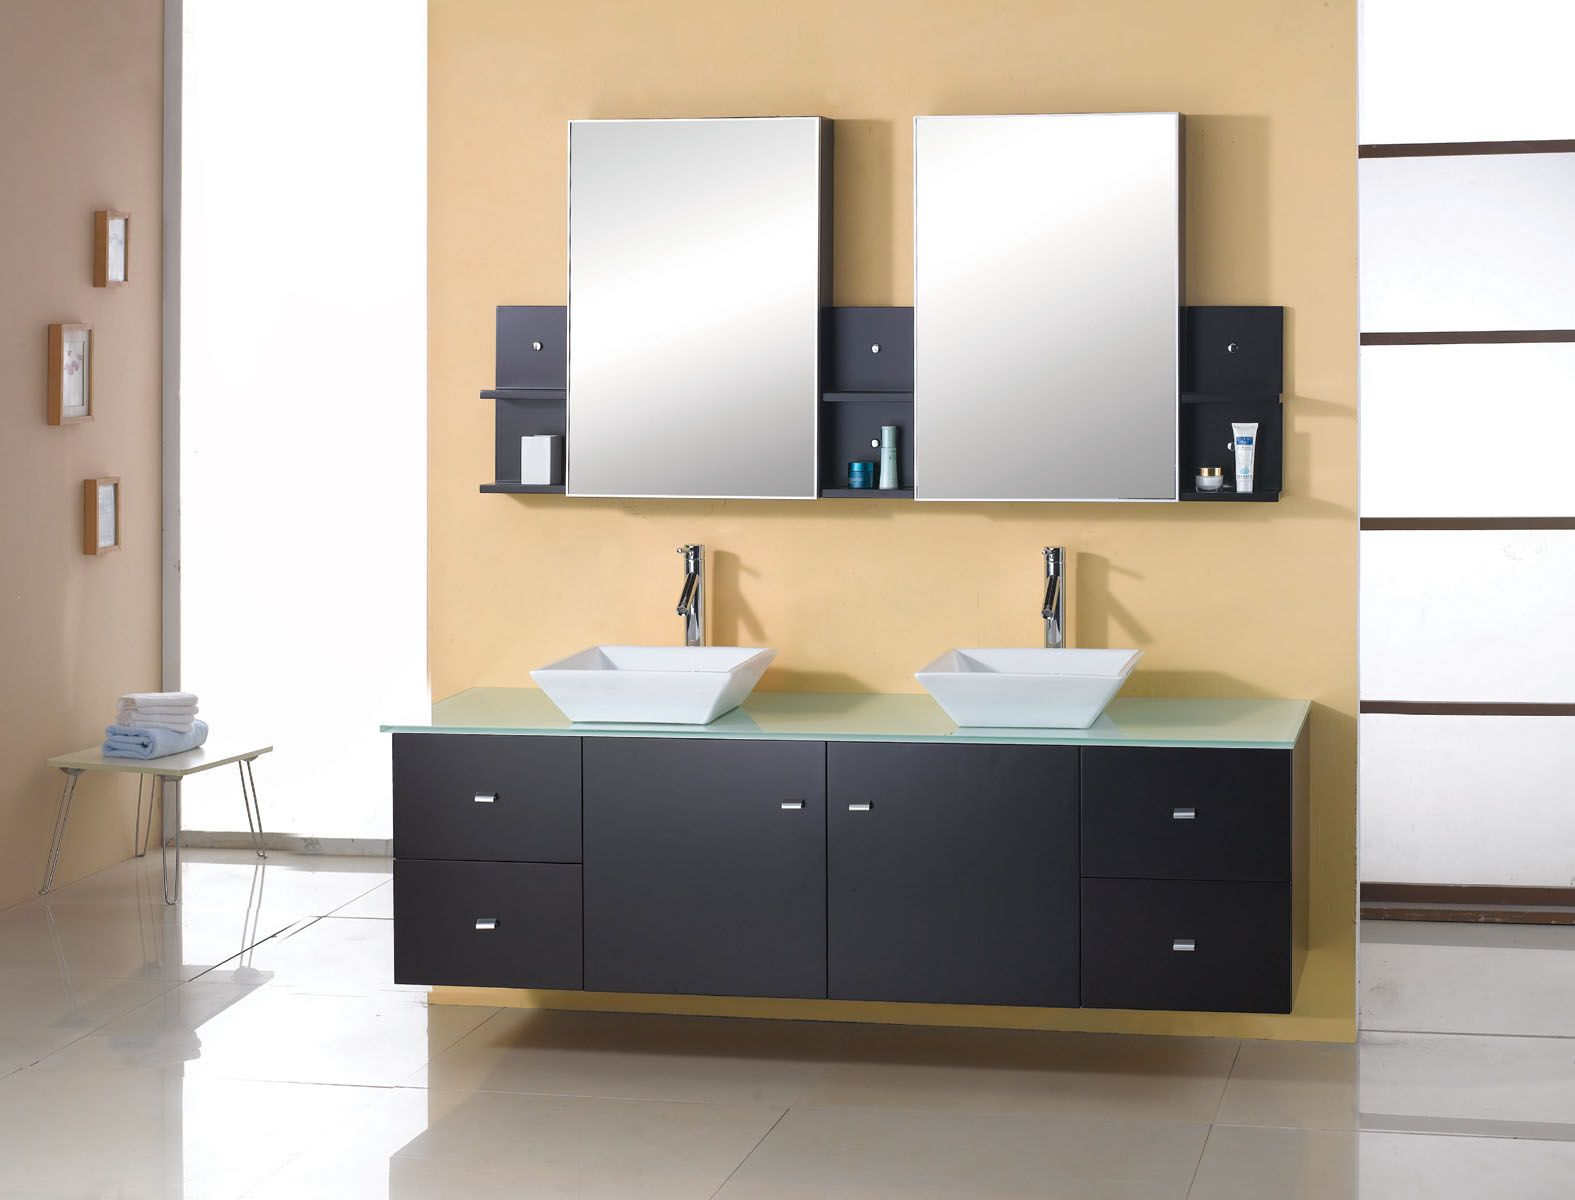 Enticing Wall Mounted Vessel Sink Vanity In Black With Rectangle Shape And Glass Vanity Top Double Vanity Bathroom Bathroom Vanity Contemporary Bathroom Vanity